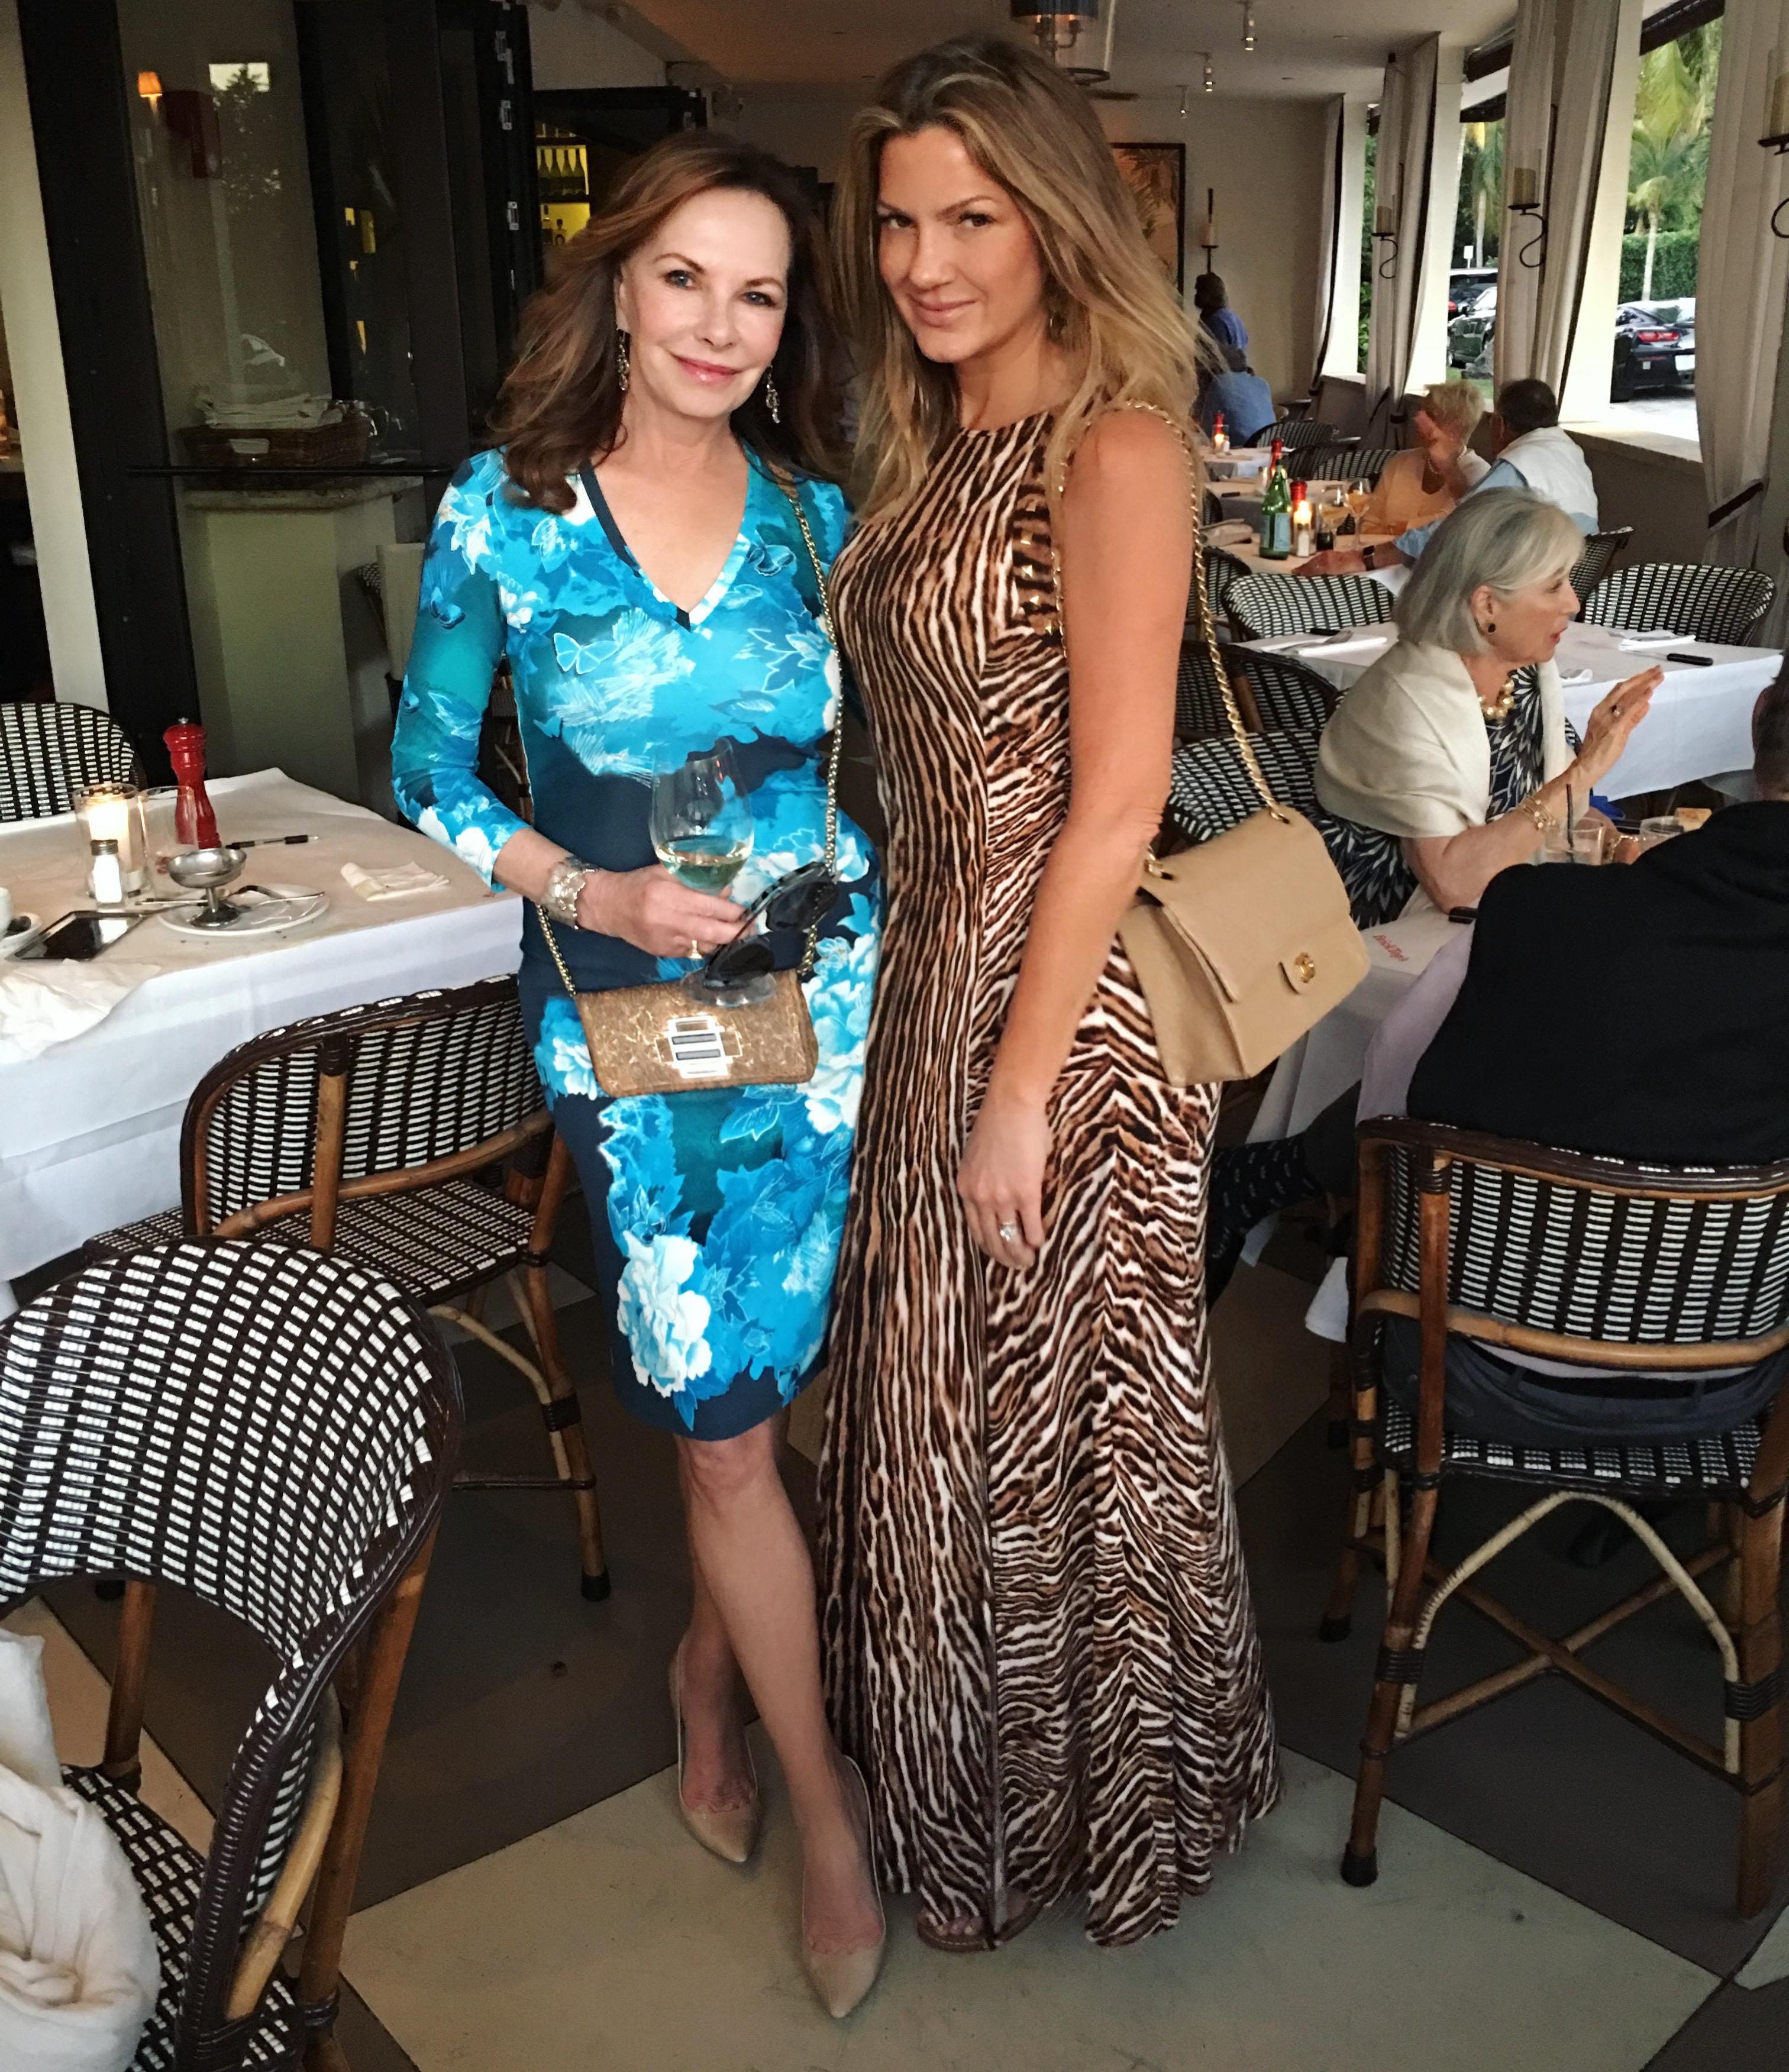 Leenie Beckett and Kelli Delaney